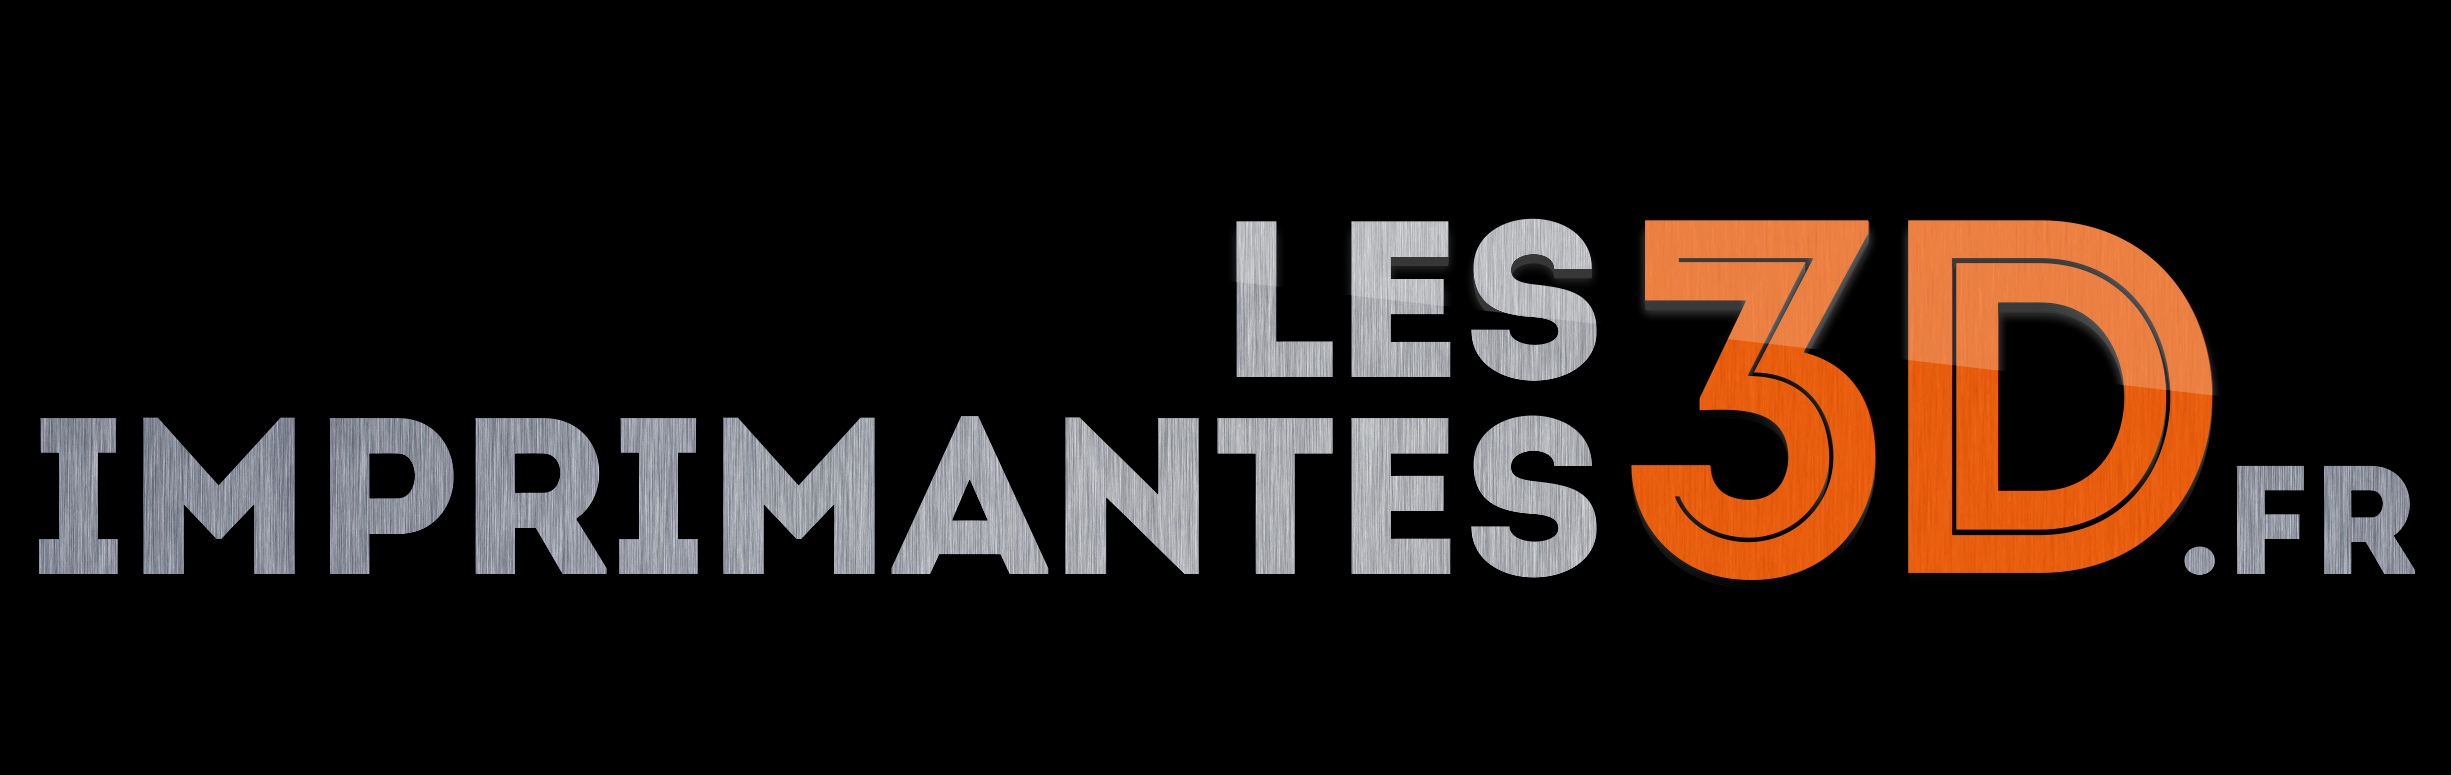 logo carré fond noir